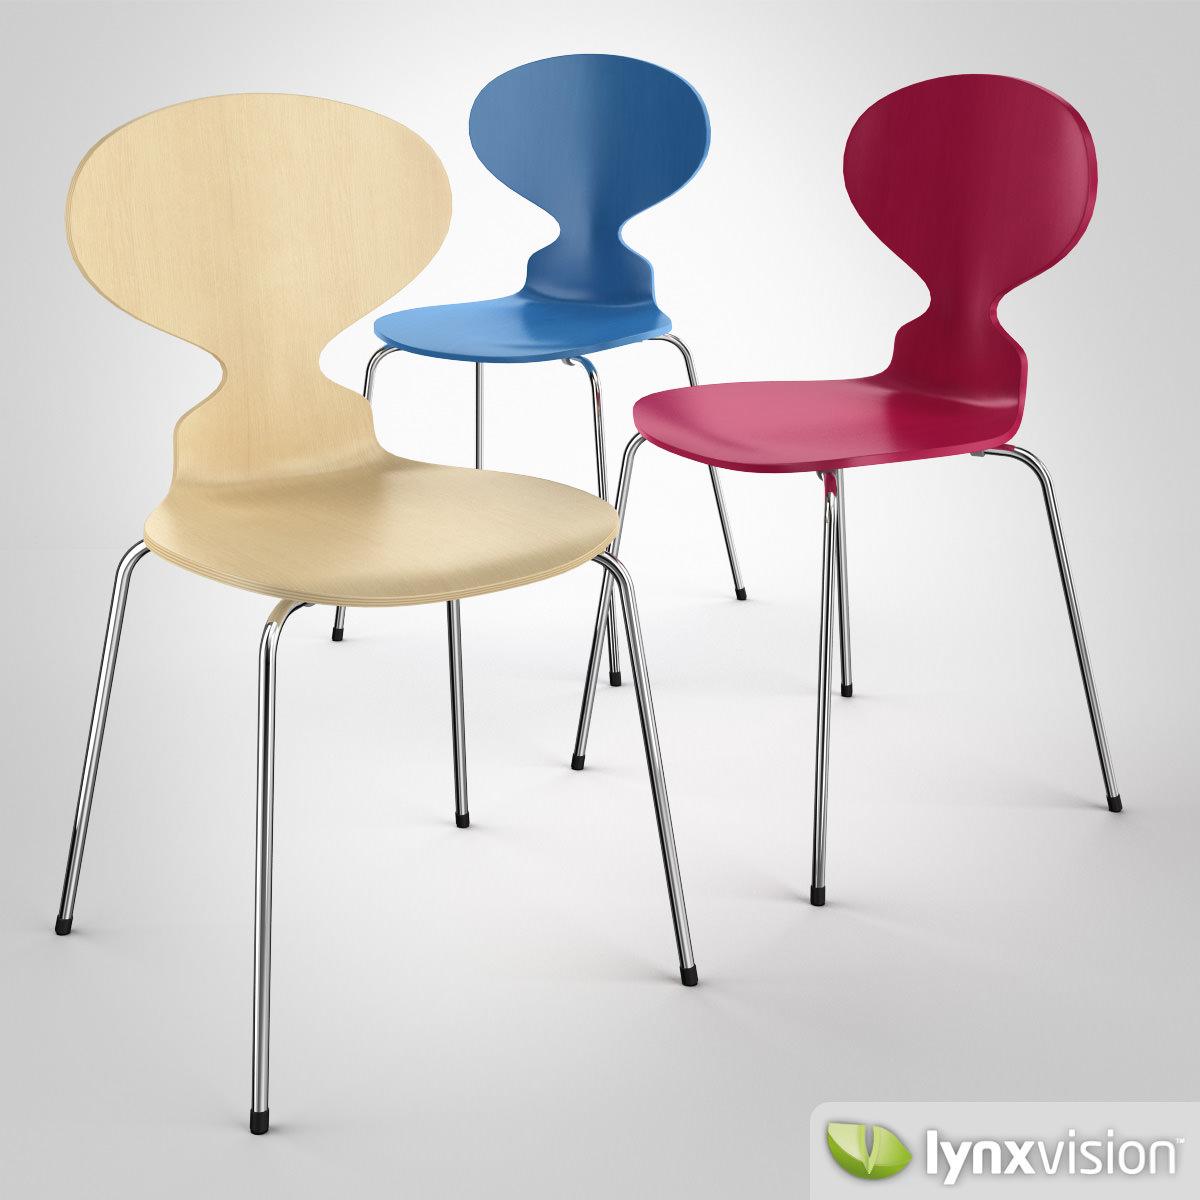 Charmant The Ant Chair 3d Model Max Obj Fbx Mtl 1 ...